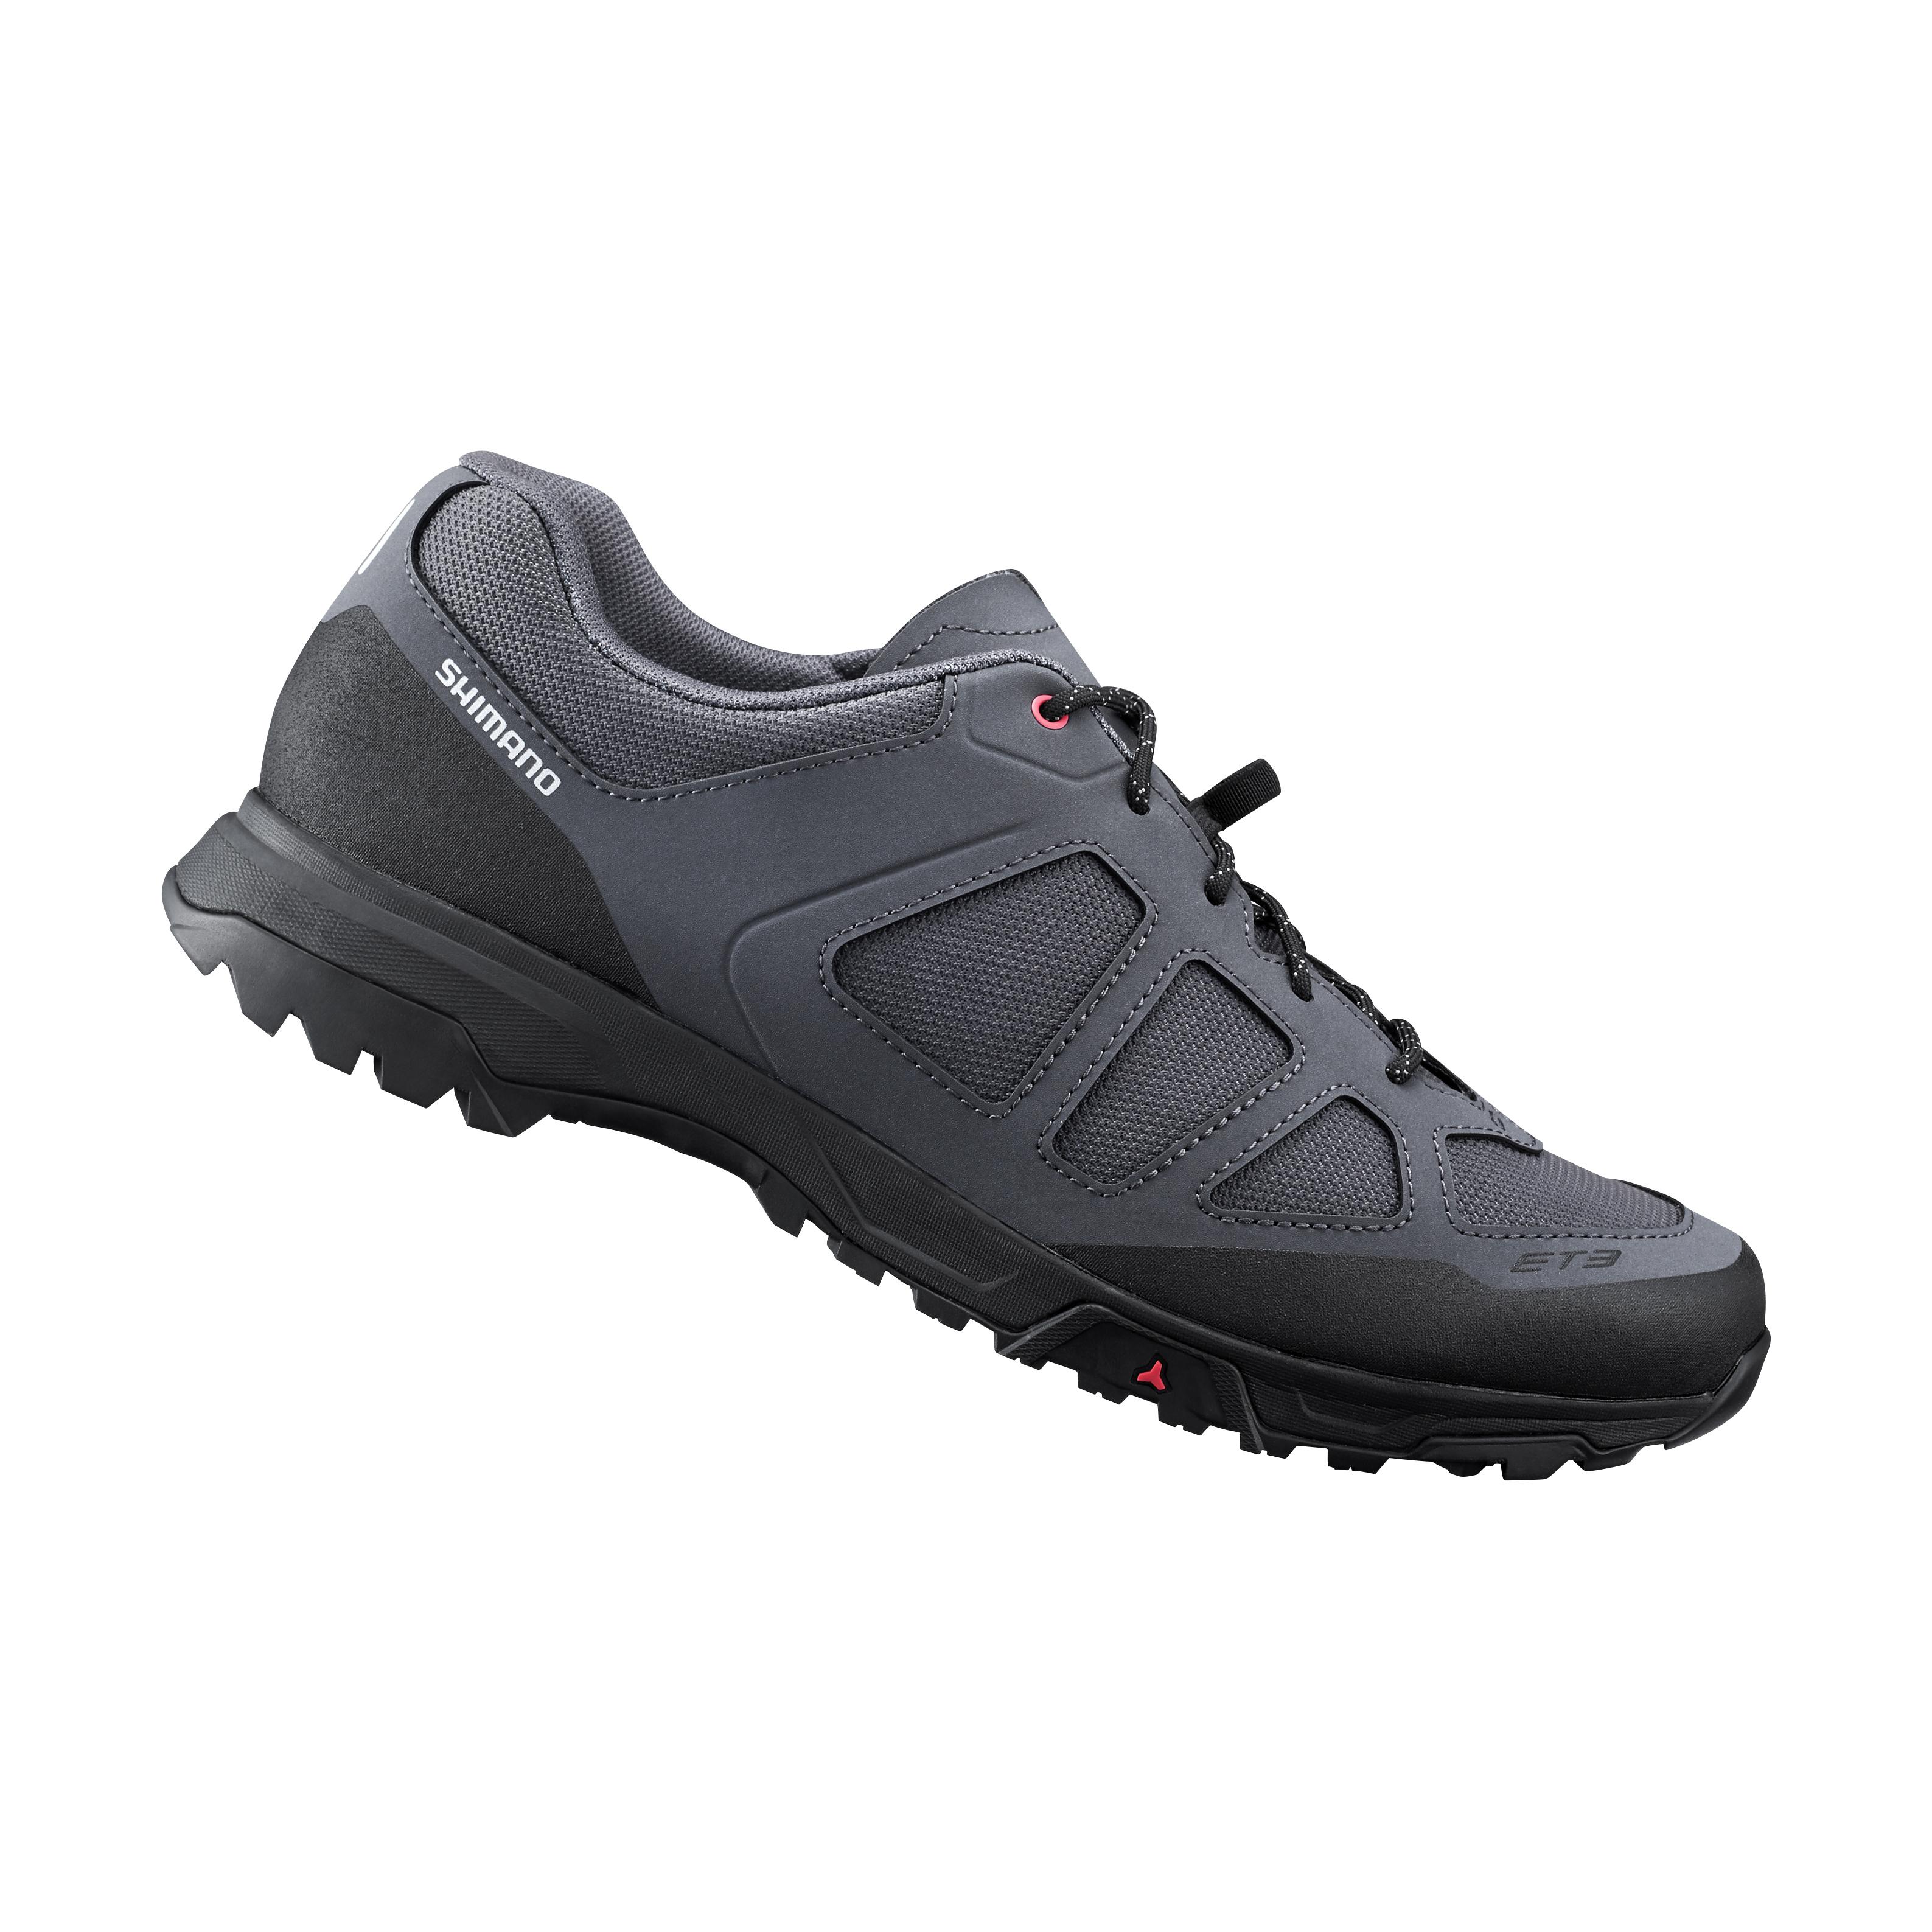 SHIMANO turistická obuv SH-ET300, šedá, 42